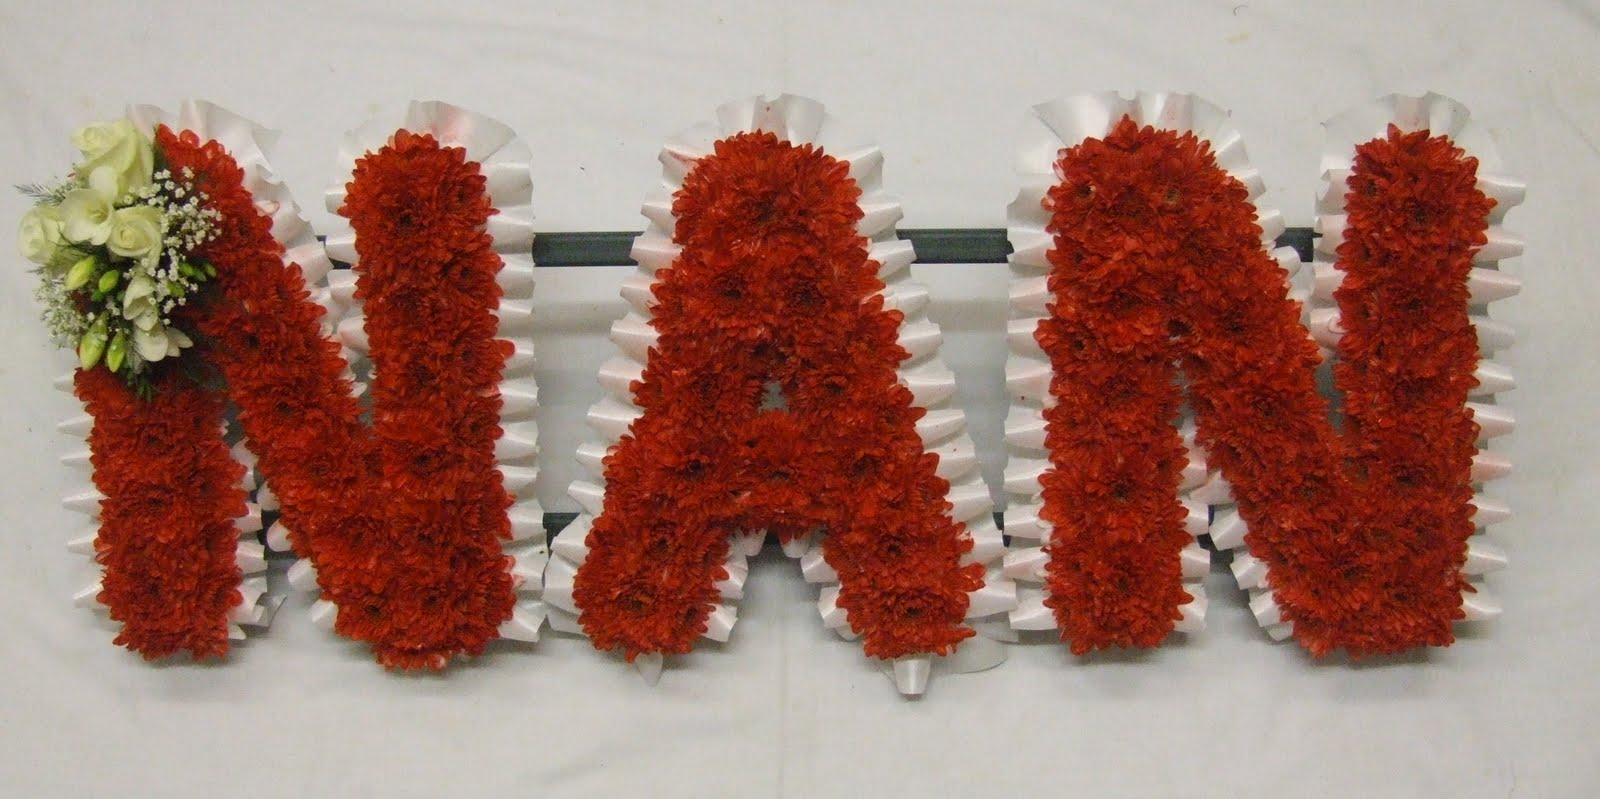 Rjs florist name tributes moni with foliage edging and lemon spray izmirmasajfo